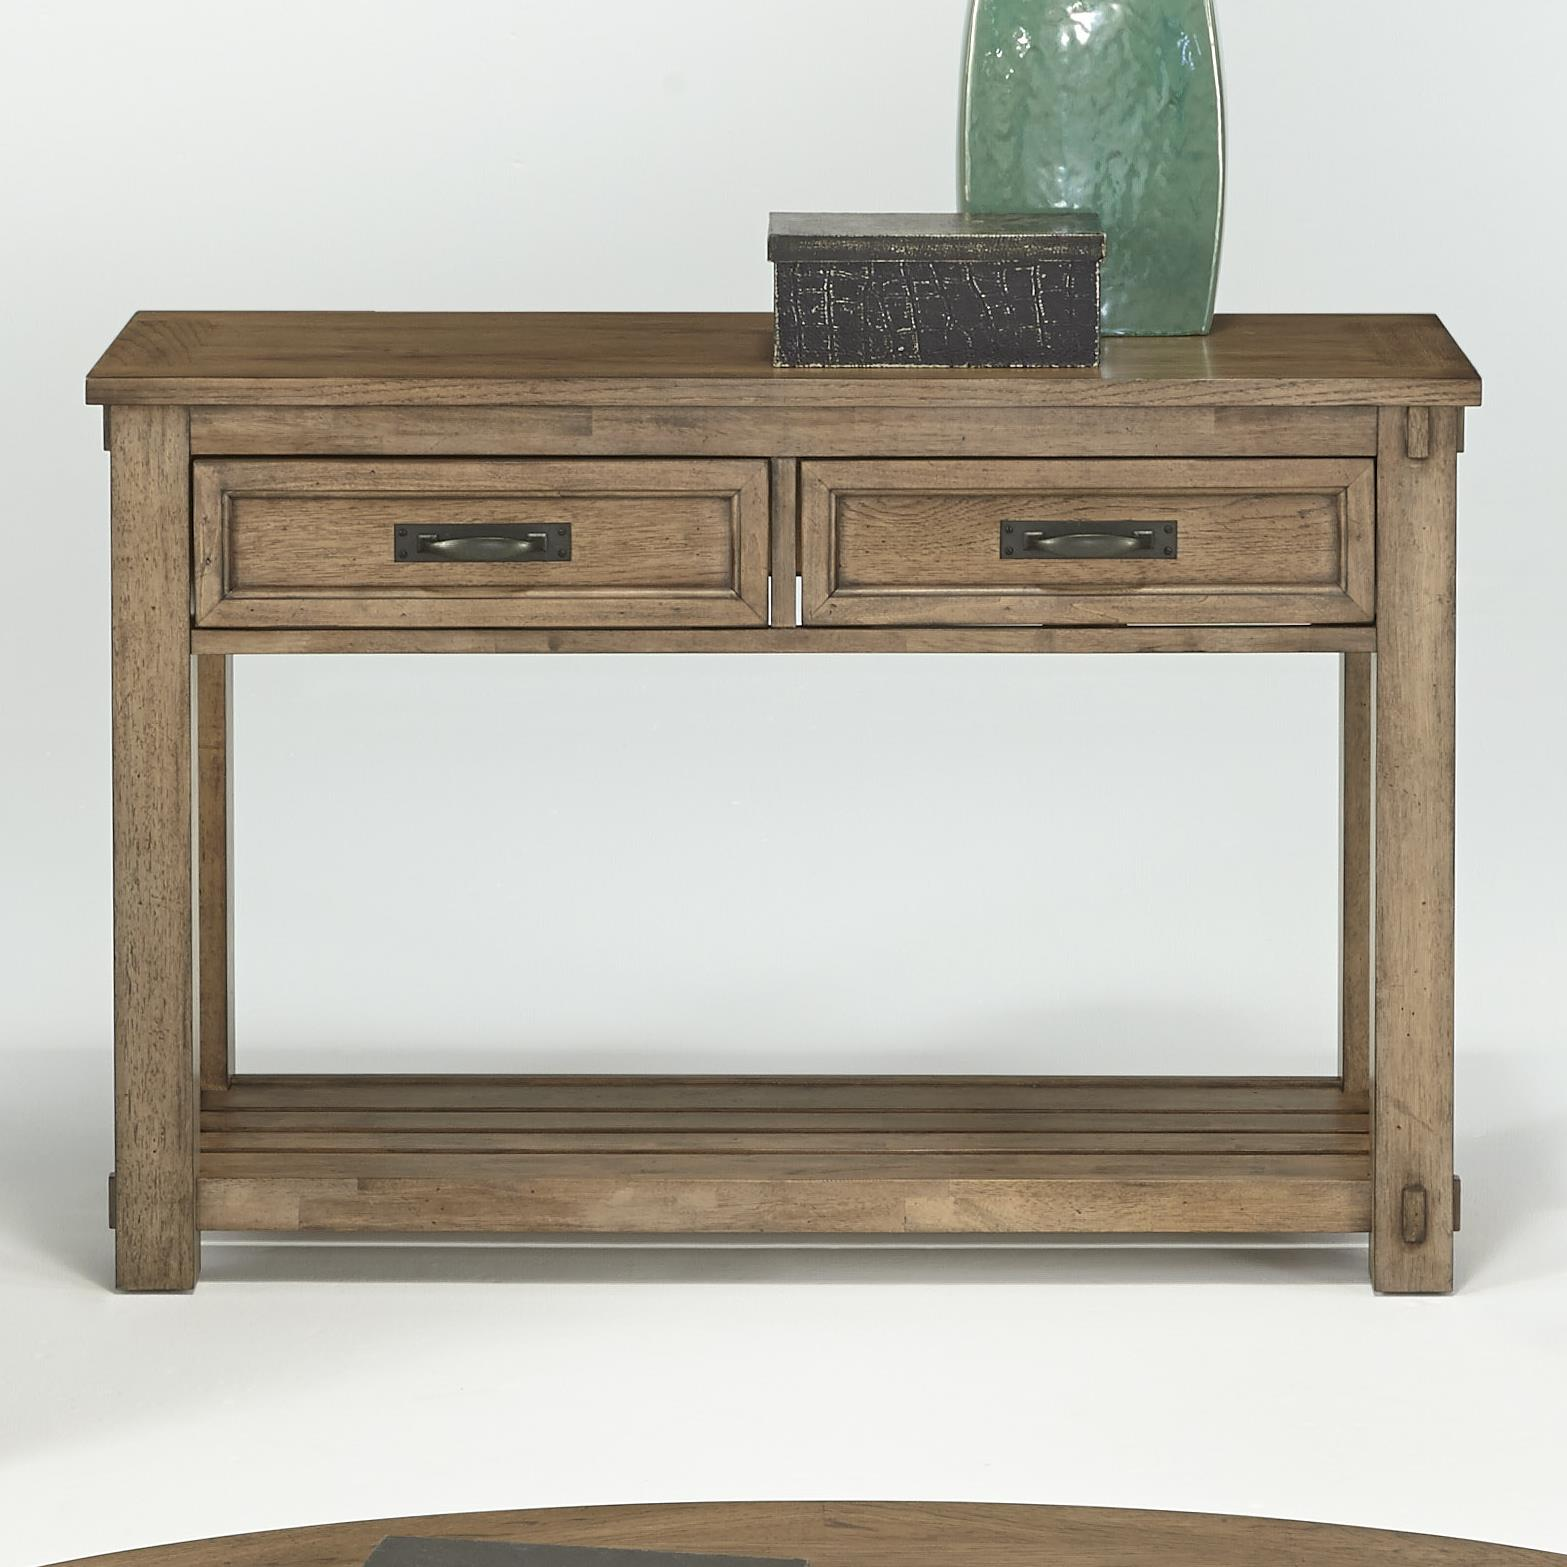 Progressive Furniture Boulder Creek Sofa/Console Table - Item Number: P549-05